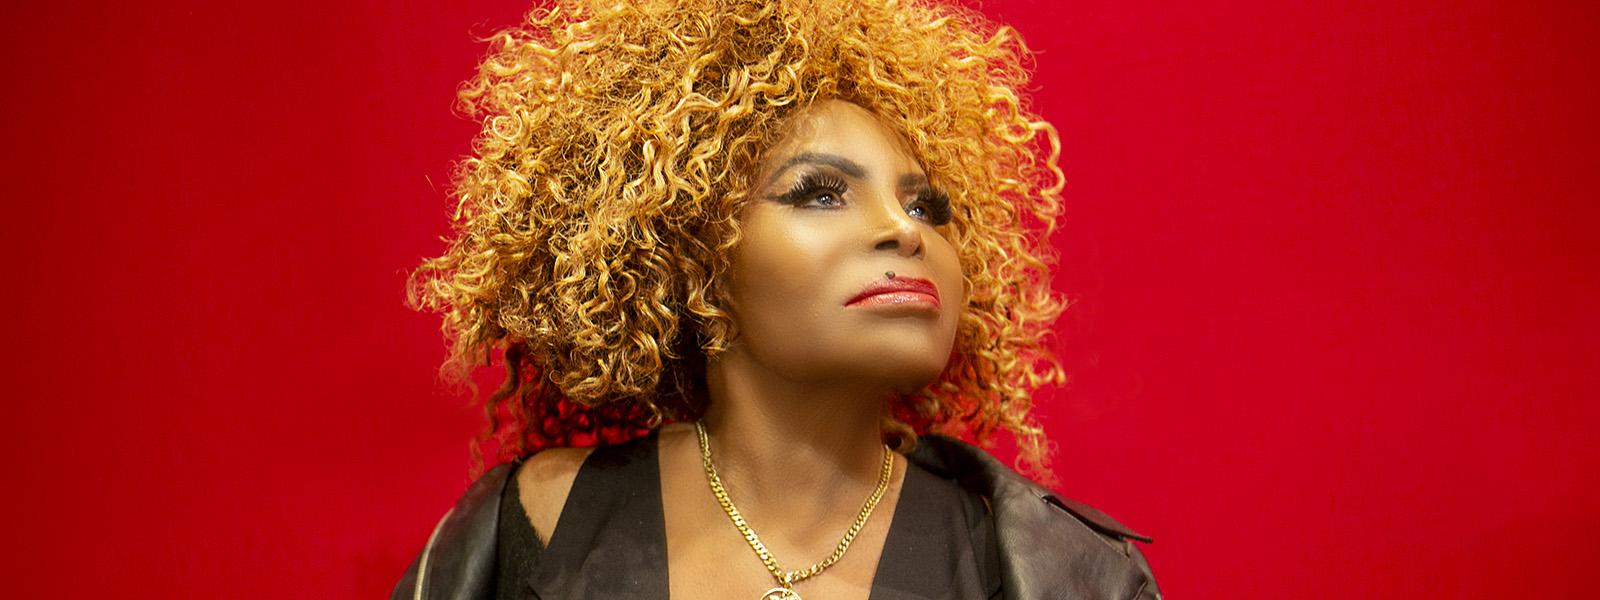 Singer, Icon, and Activist: Elza Soares